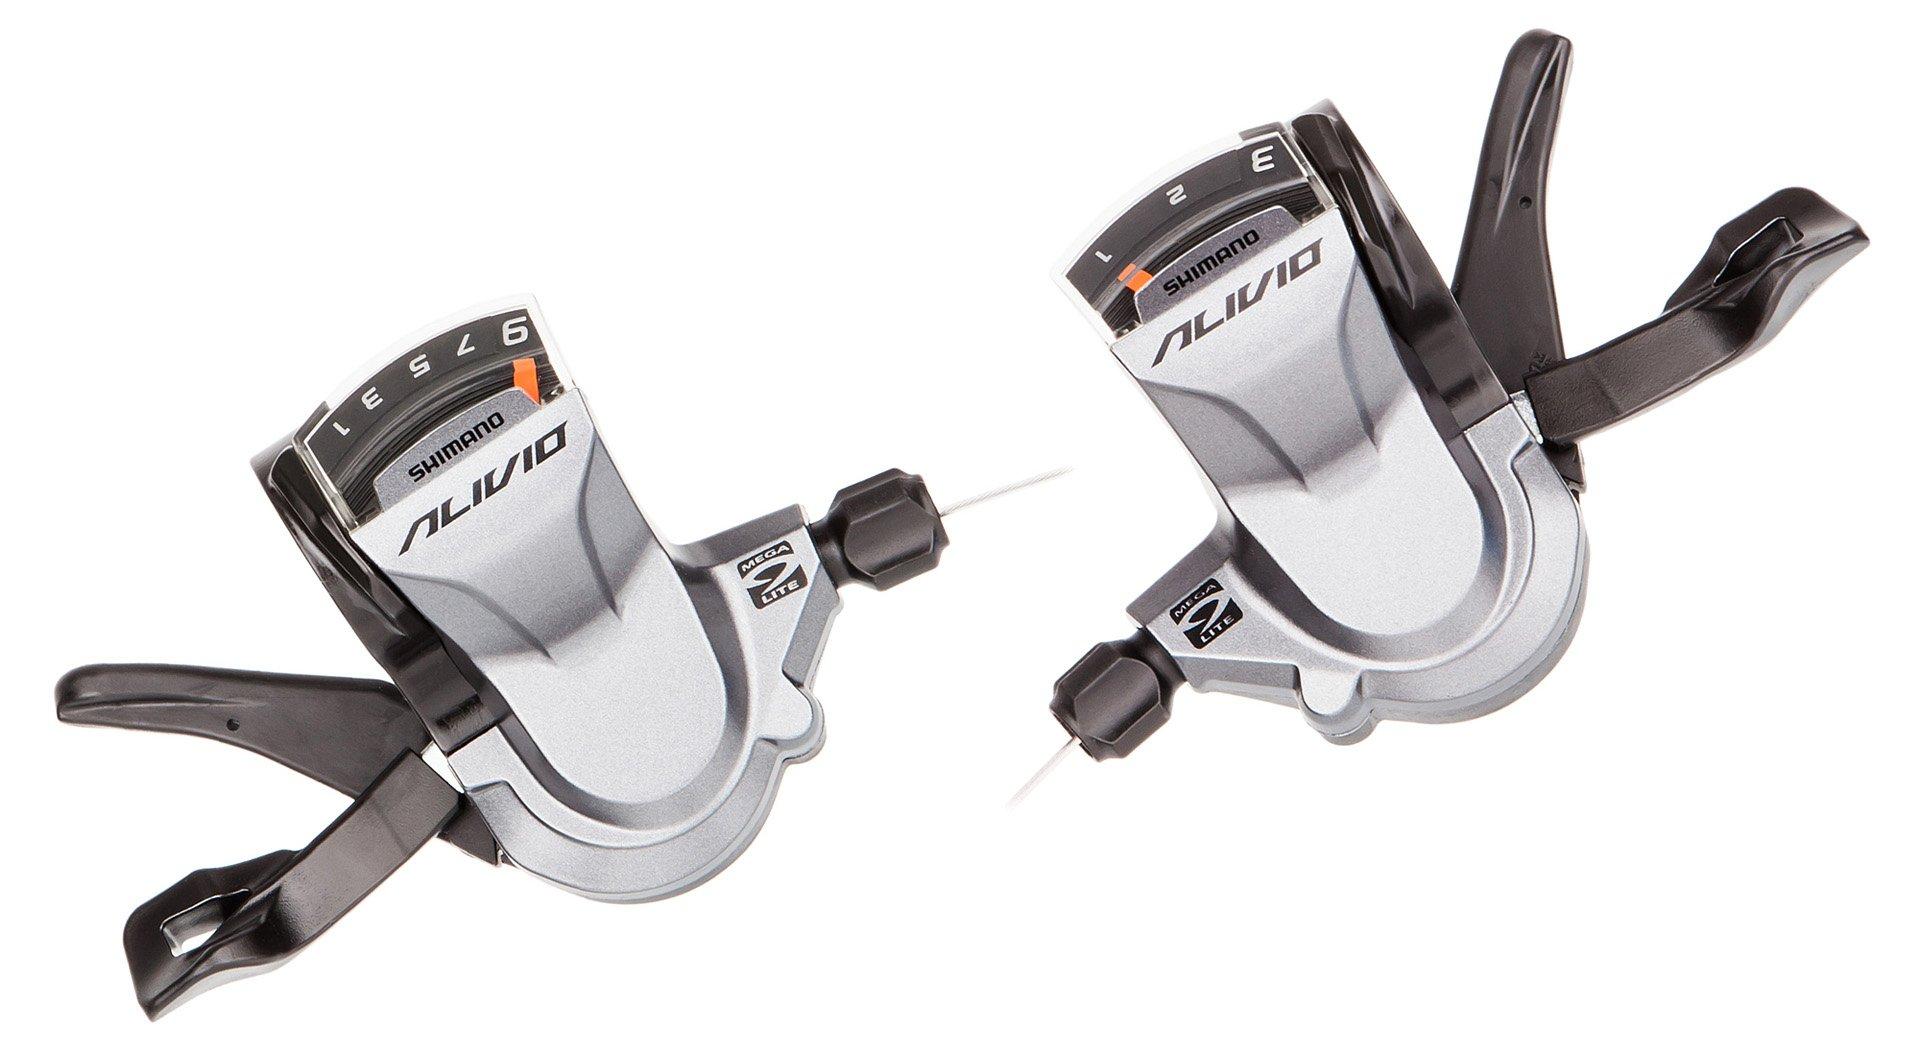 Shimano Alivio SL-M4000 9-Speed Right Shifter